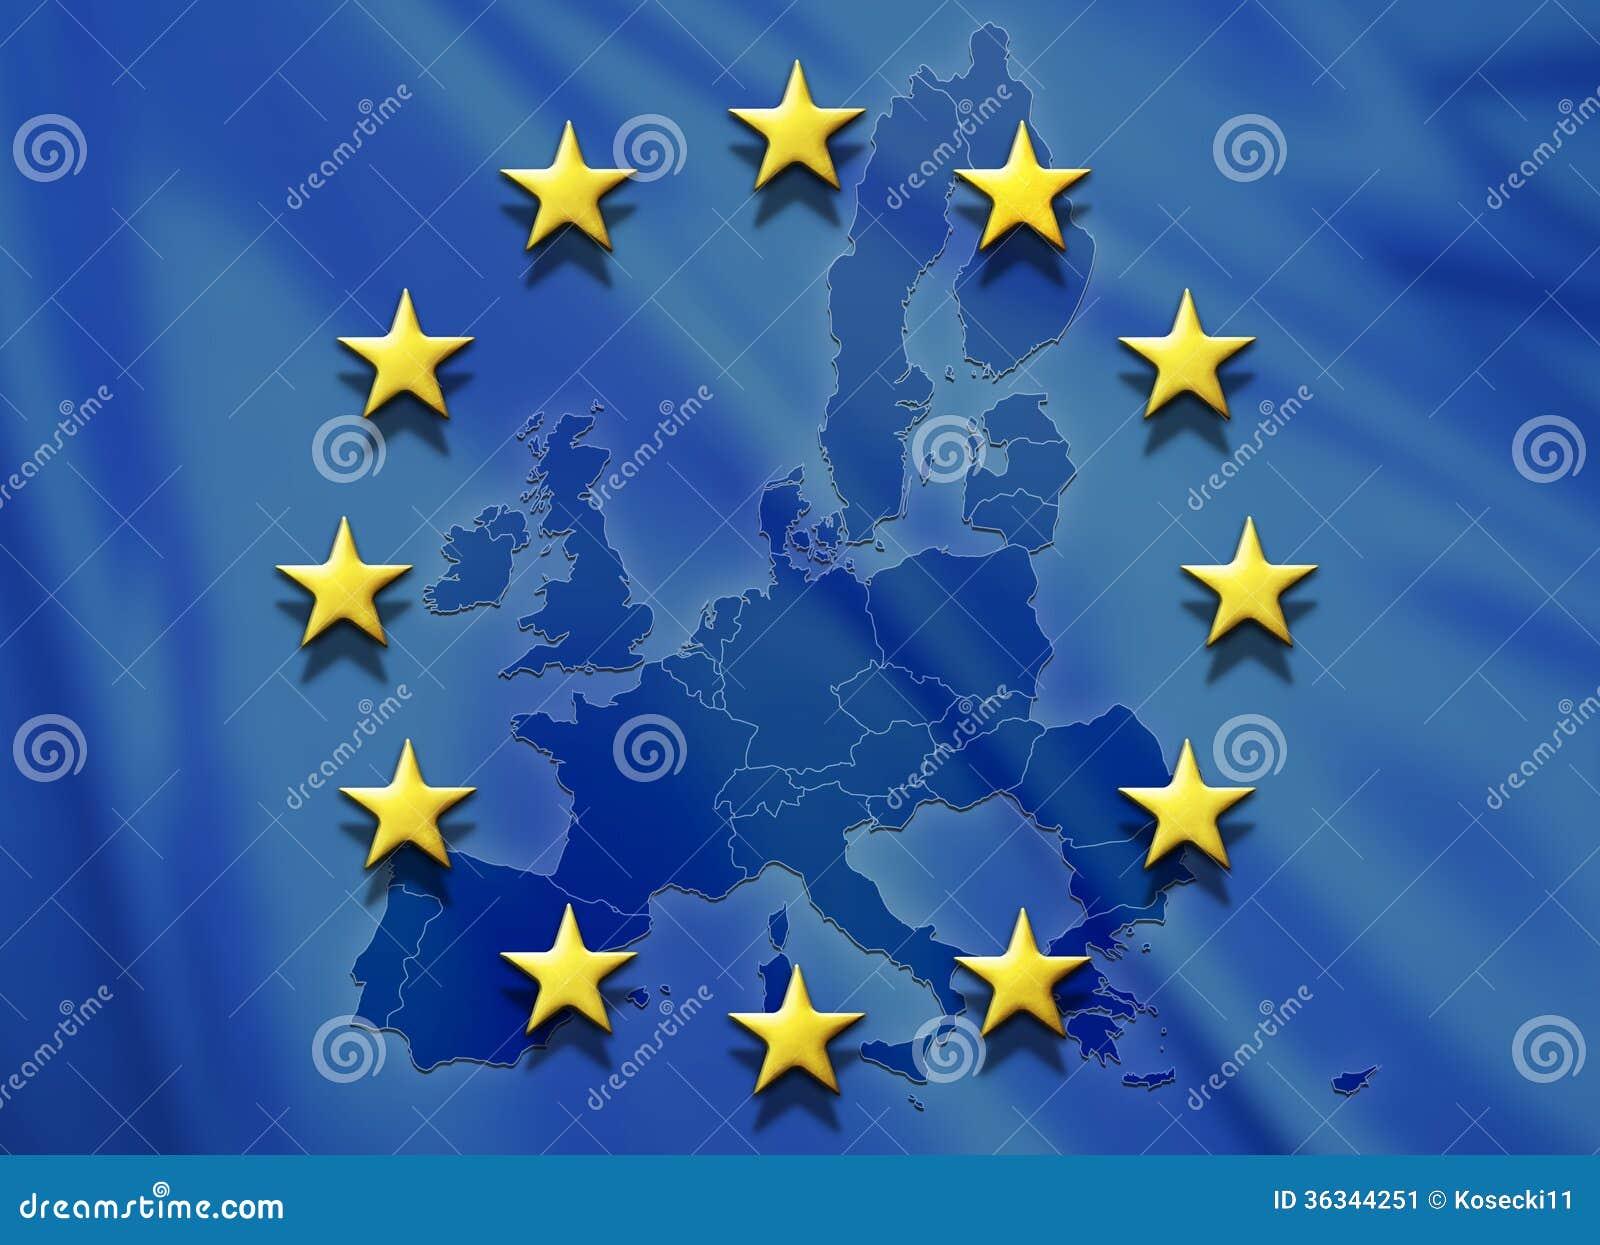 EU Flag Stock Image - Image: 36344251